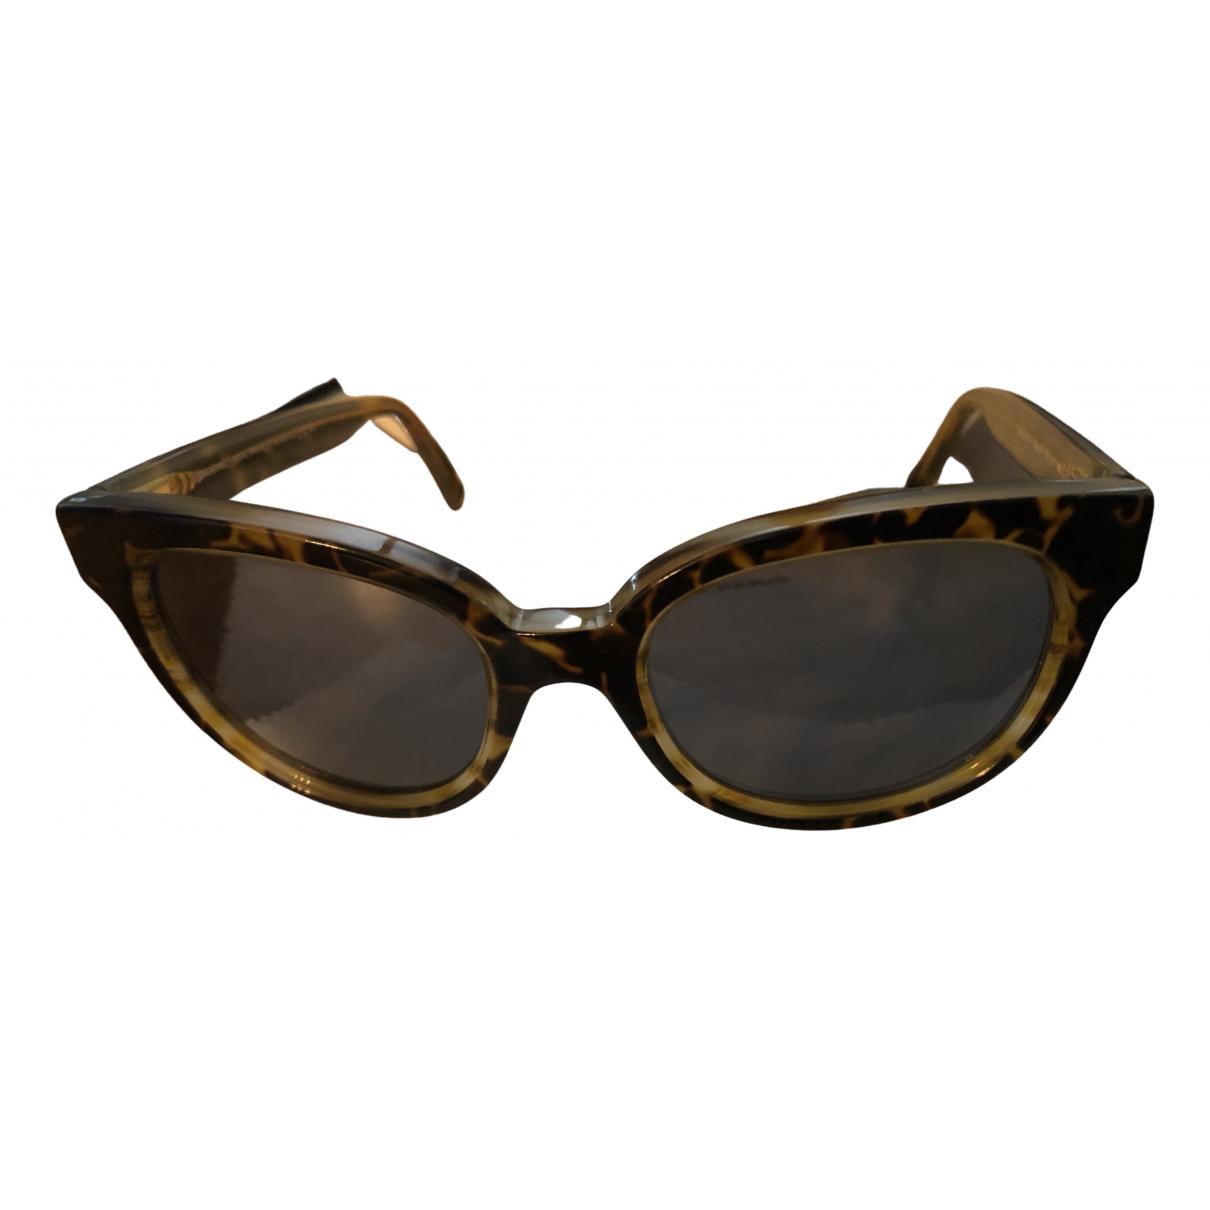 Balenciaga \N Camel Sunglasses for Women \N